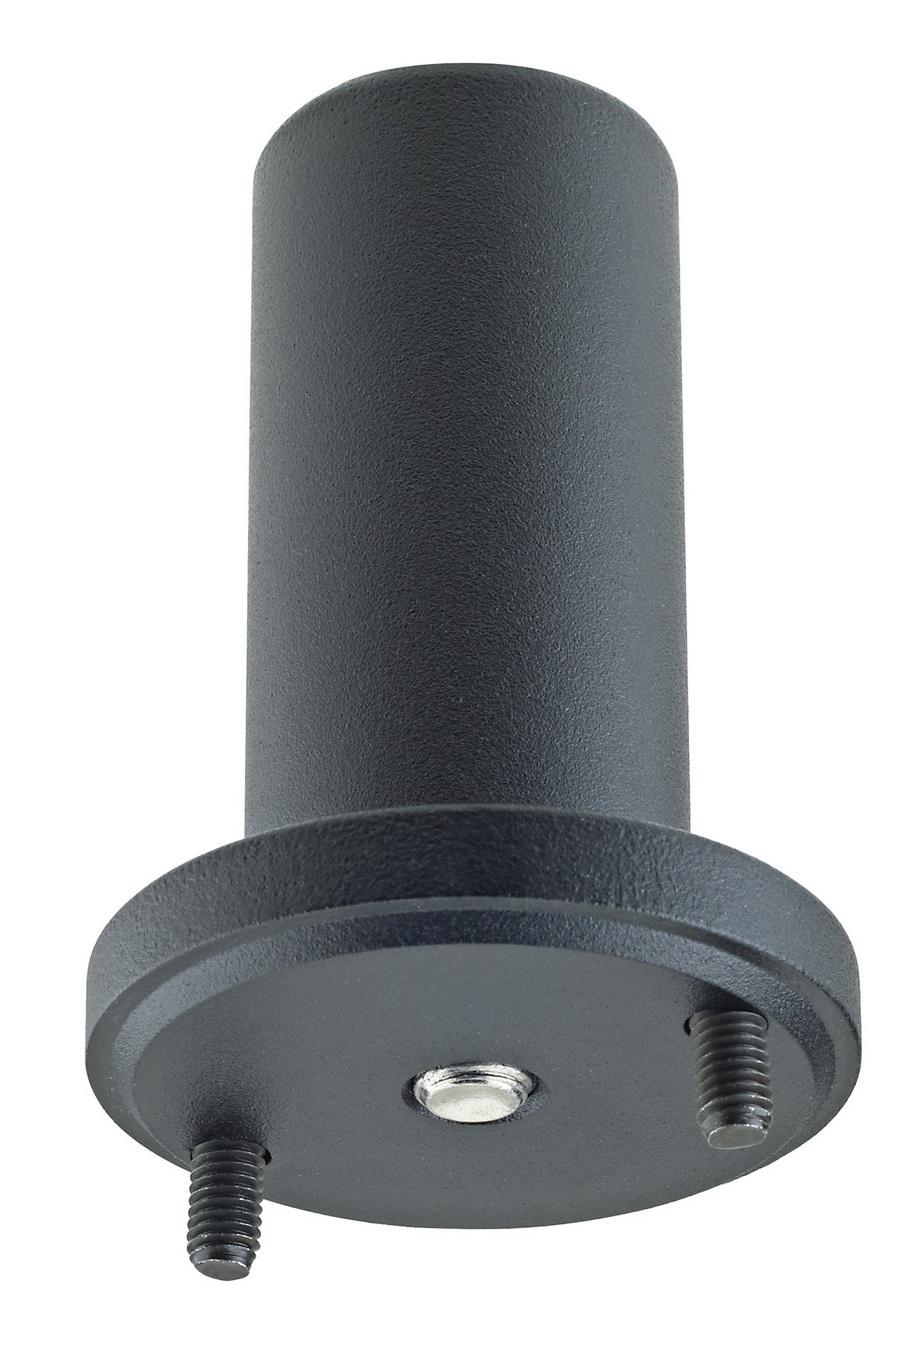 K&M 26793 Adapter